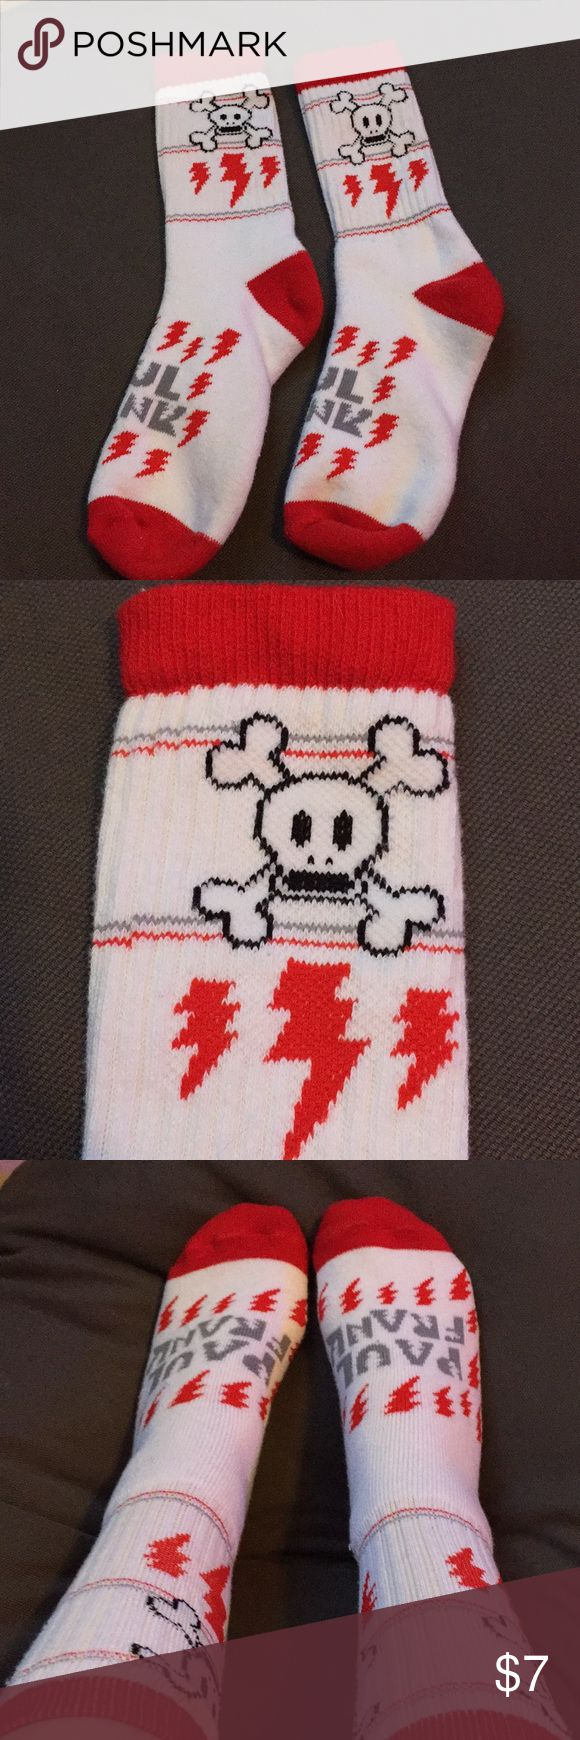 Paul Frank Socks Paul Frank socks, plush foot, size small Paul Frank Accessories Hosiery & Socks